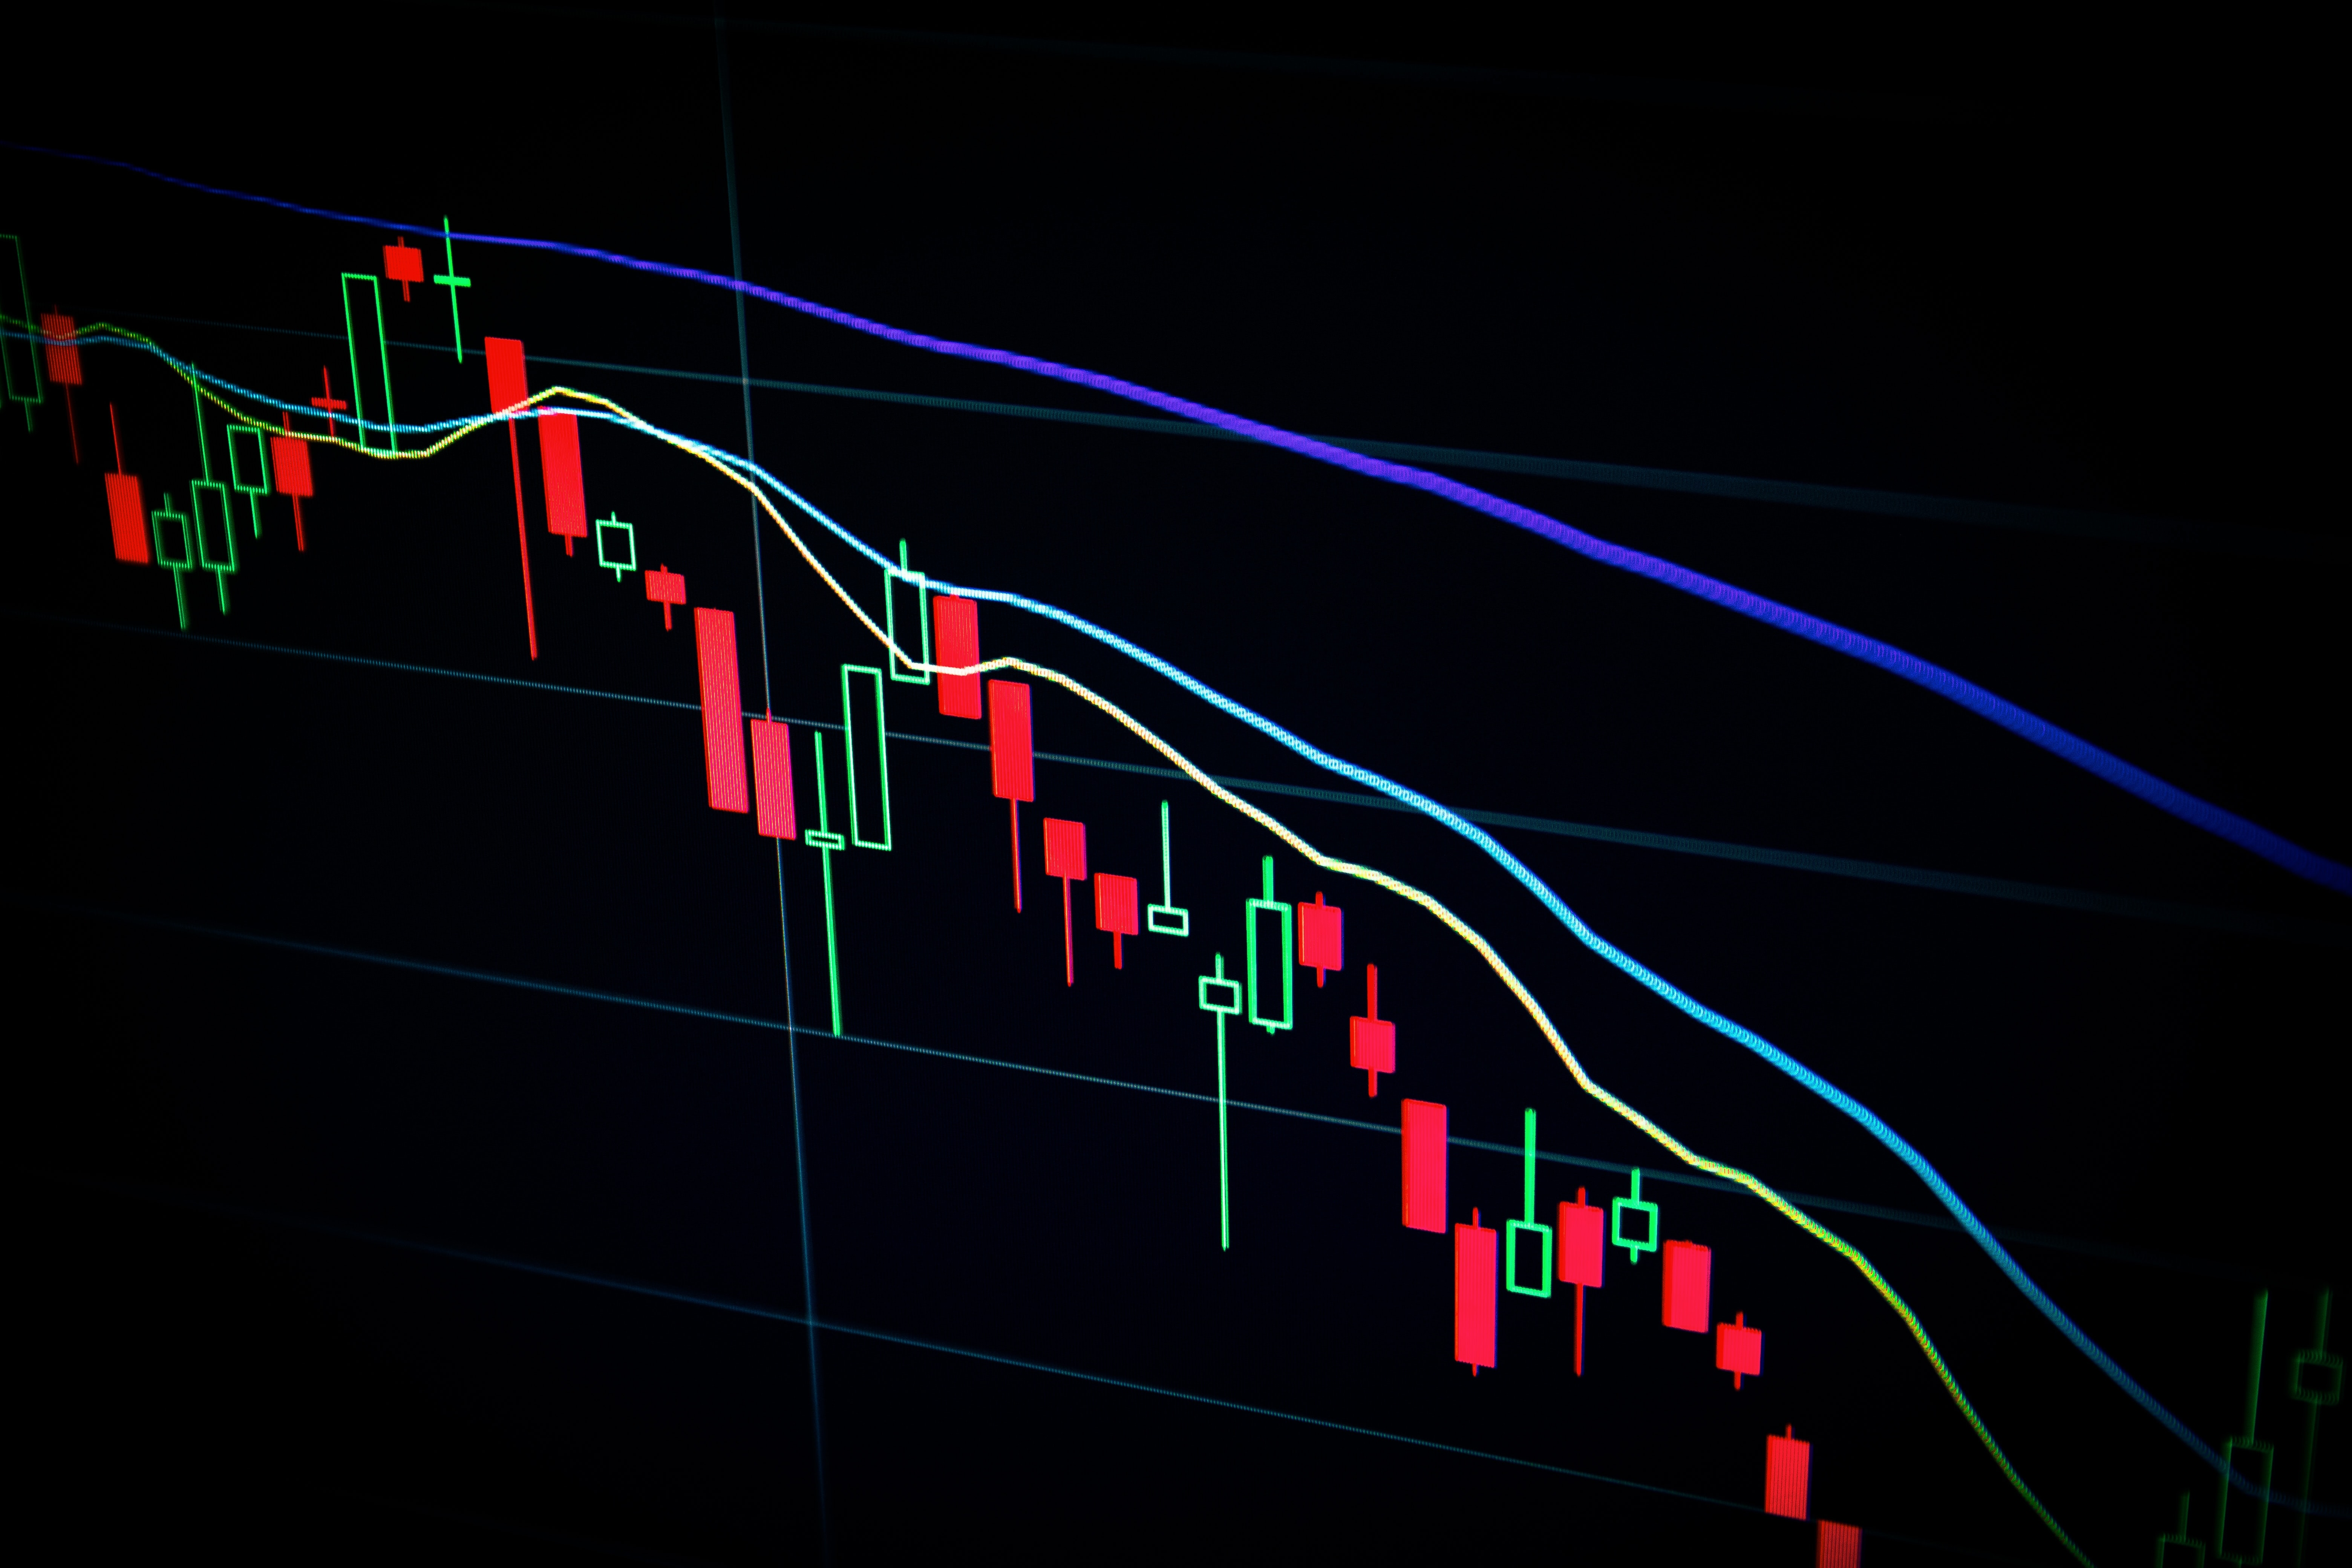 El Salvador Buys 150 Bitcoin During The Dip, Chad Move Or Foolish Endeavor?